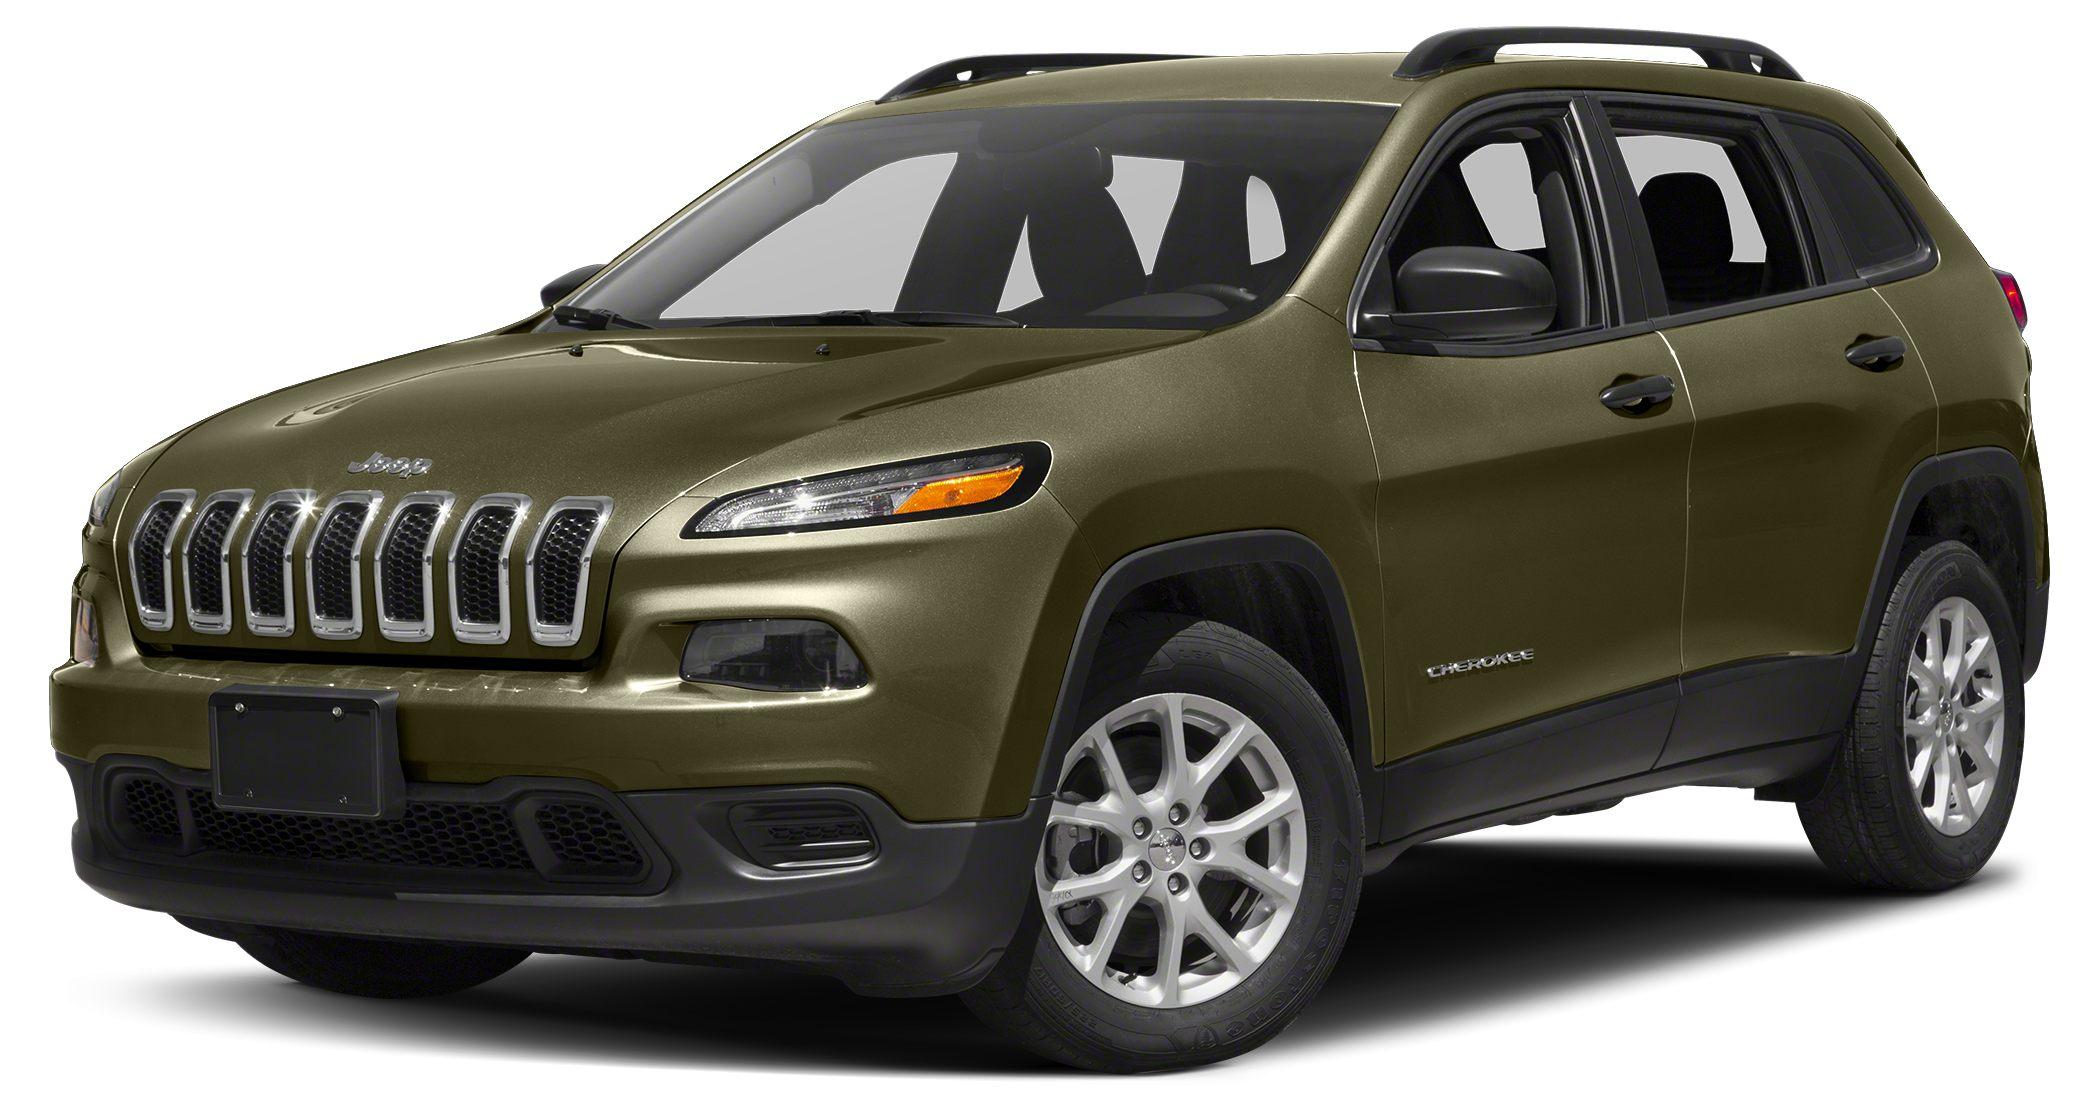 2016 Jeep Cherokee Sport Color Light Brownstone Pearlcoat Stock 16X770 VIN 1C4PJLAB7GW274297